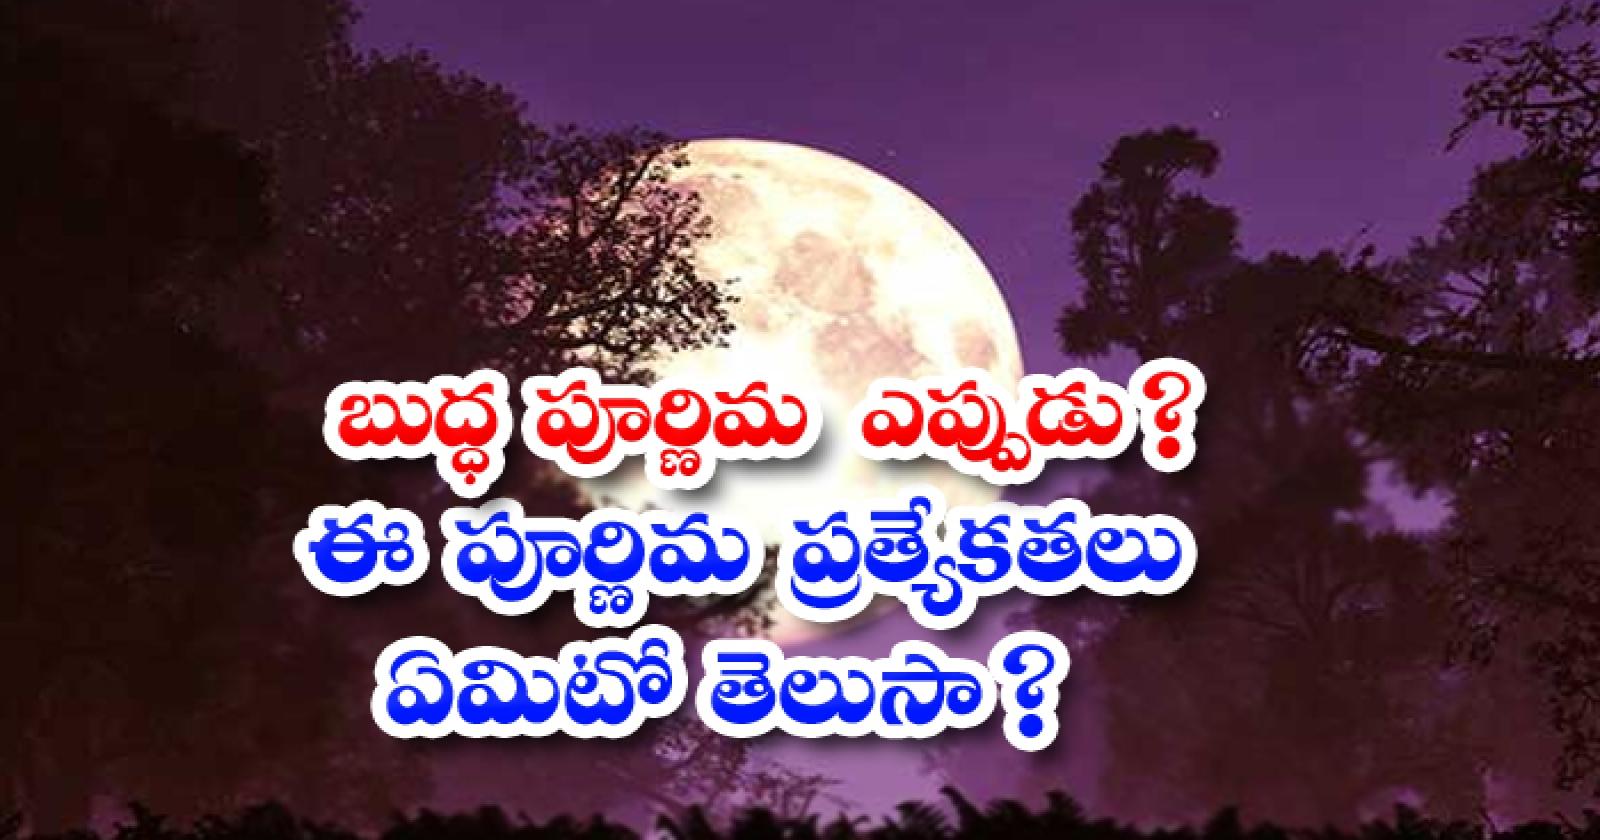 Buddha Purnima 2021 Date Time Significance-బుద్ధ పూర్ణిమ ఎప్పుడు ఈ పౌర్ణమి ప్రత్యేకతలు ఏమిటో తెలుసా-Latest News - Telugu-Telugu Tollywood Photo Image-TeluguStop.com